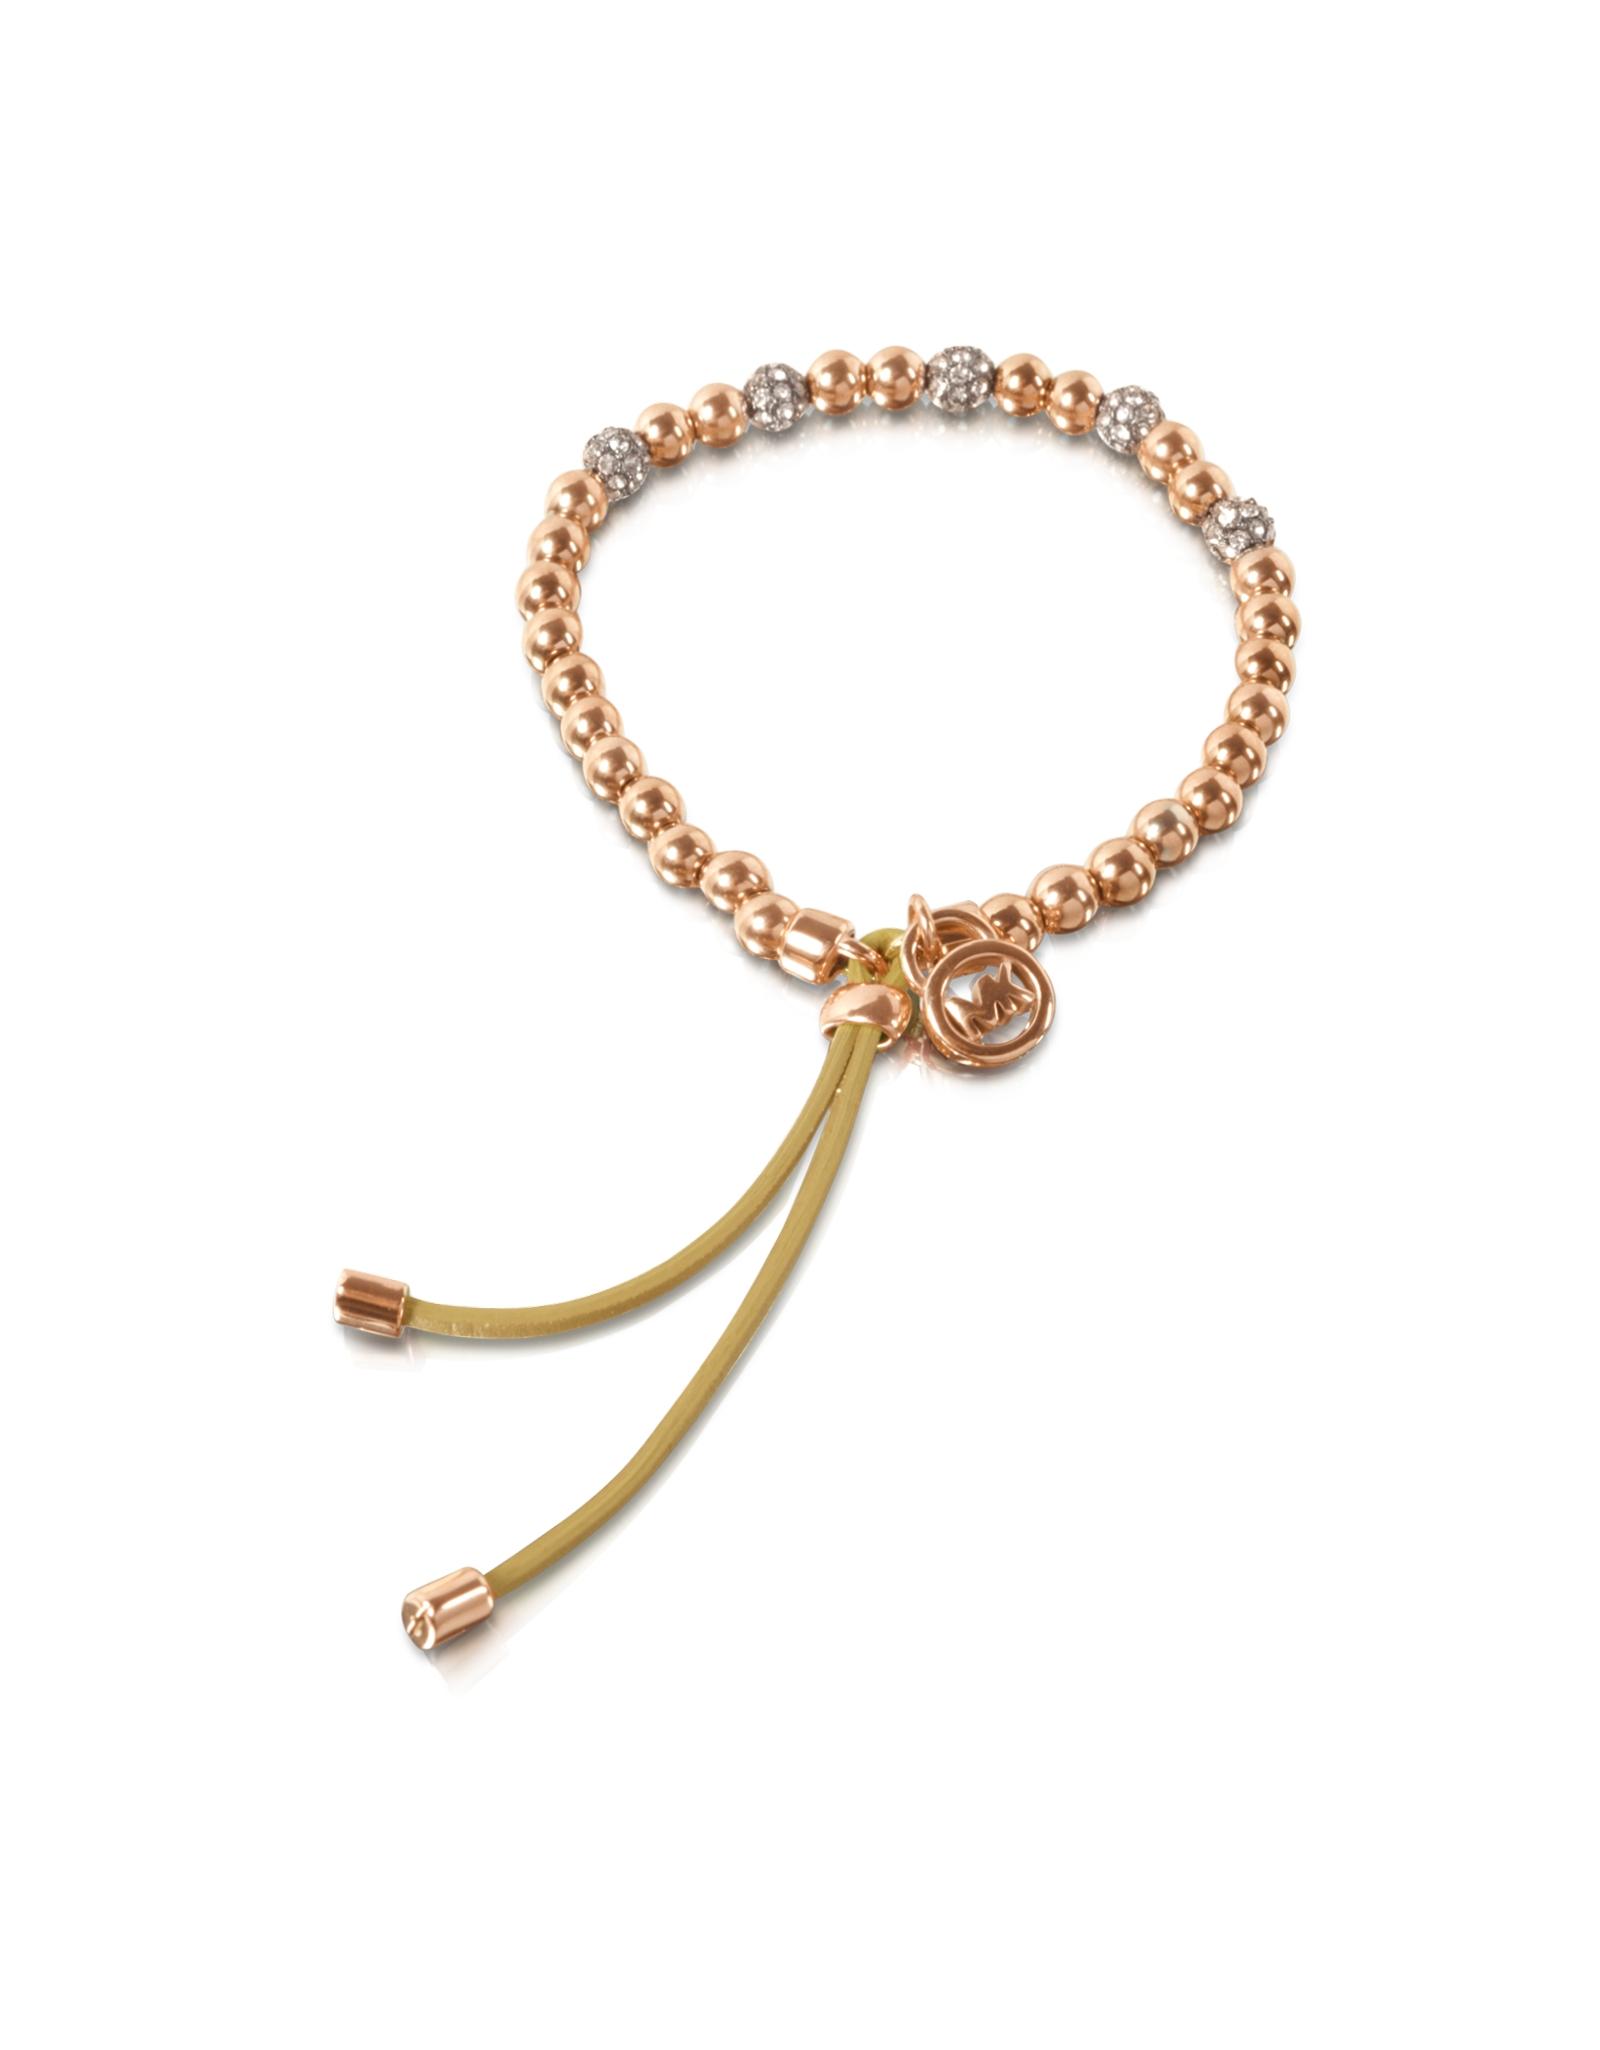 7ad602d07039 michael kors rose gold bead bracelet uk crossbody large - Marwood ...